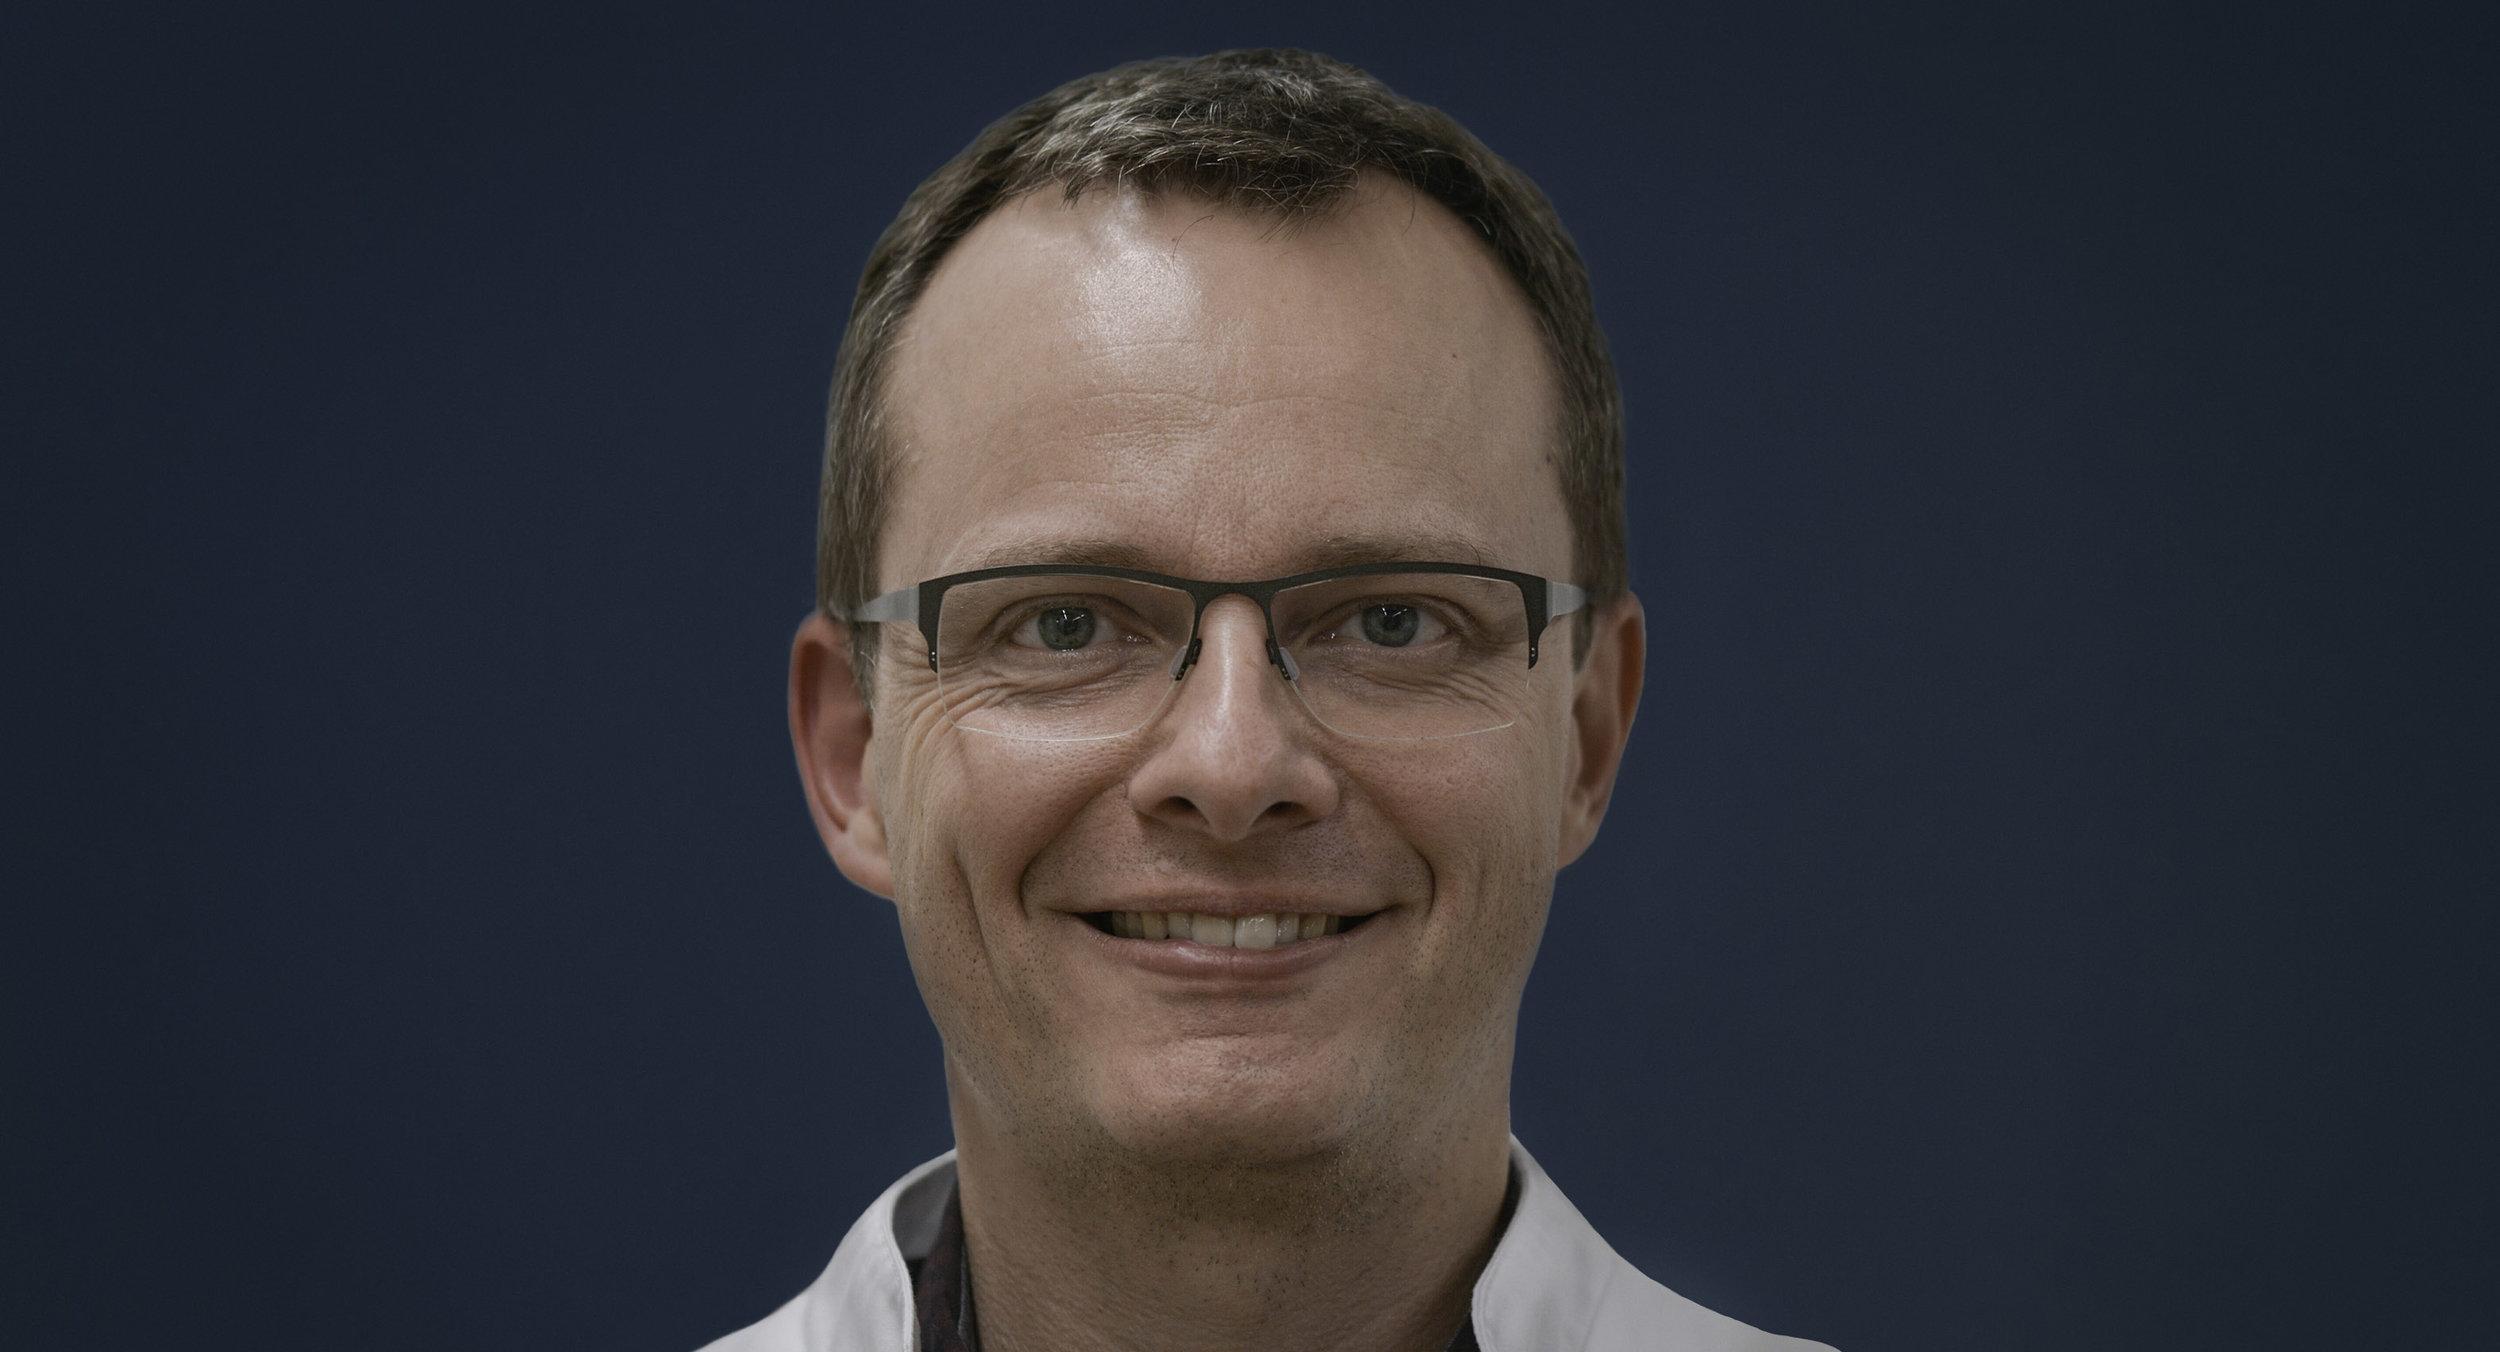 PD Dr. med. Günter Eisele